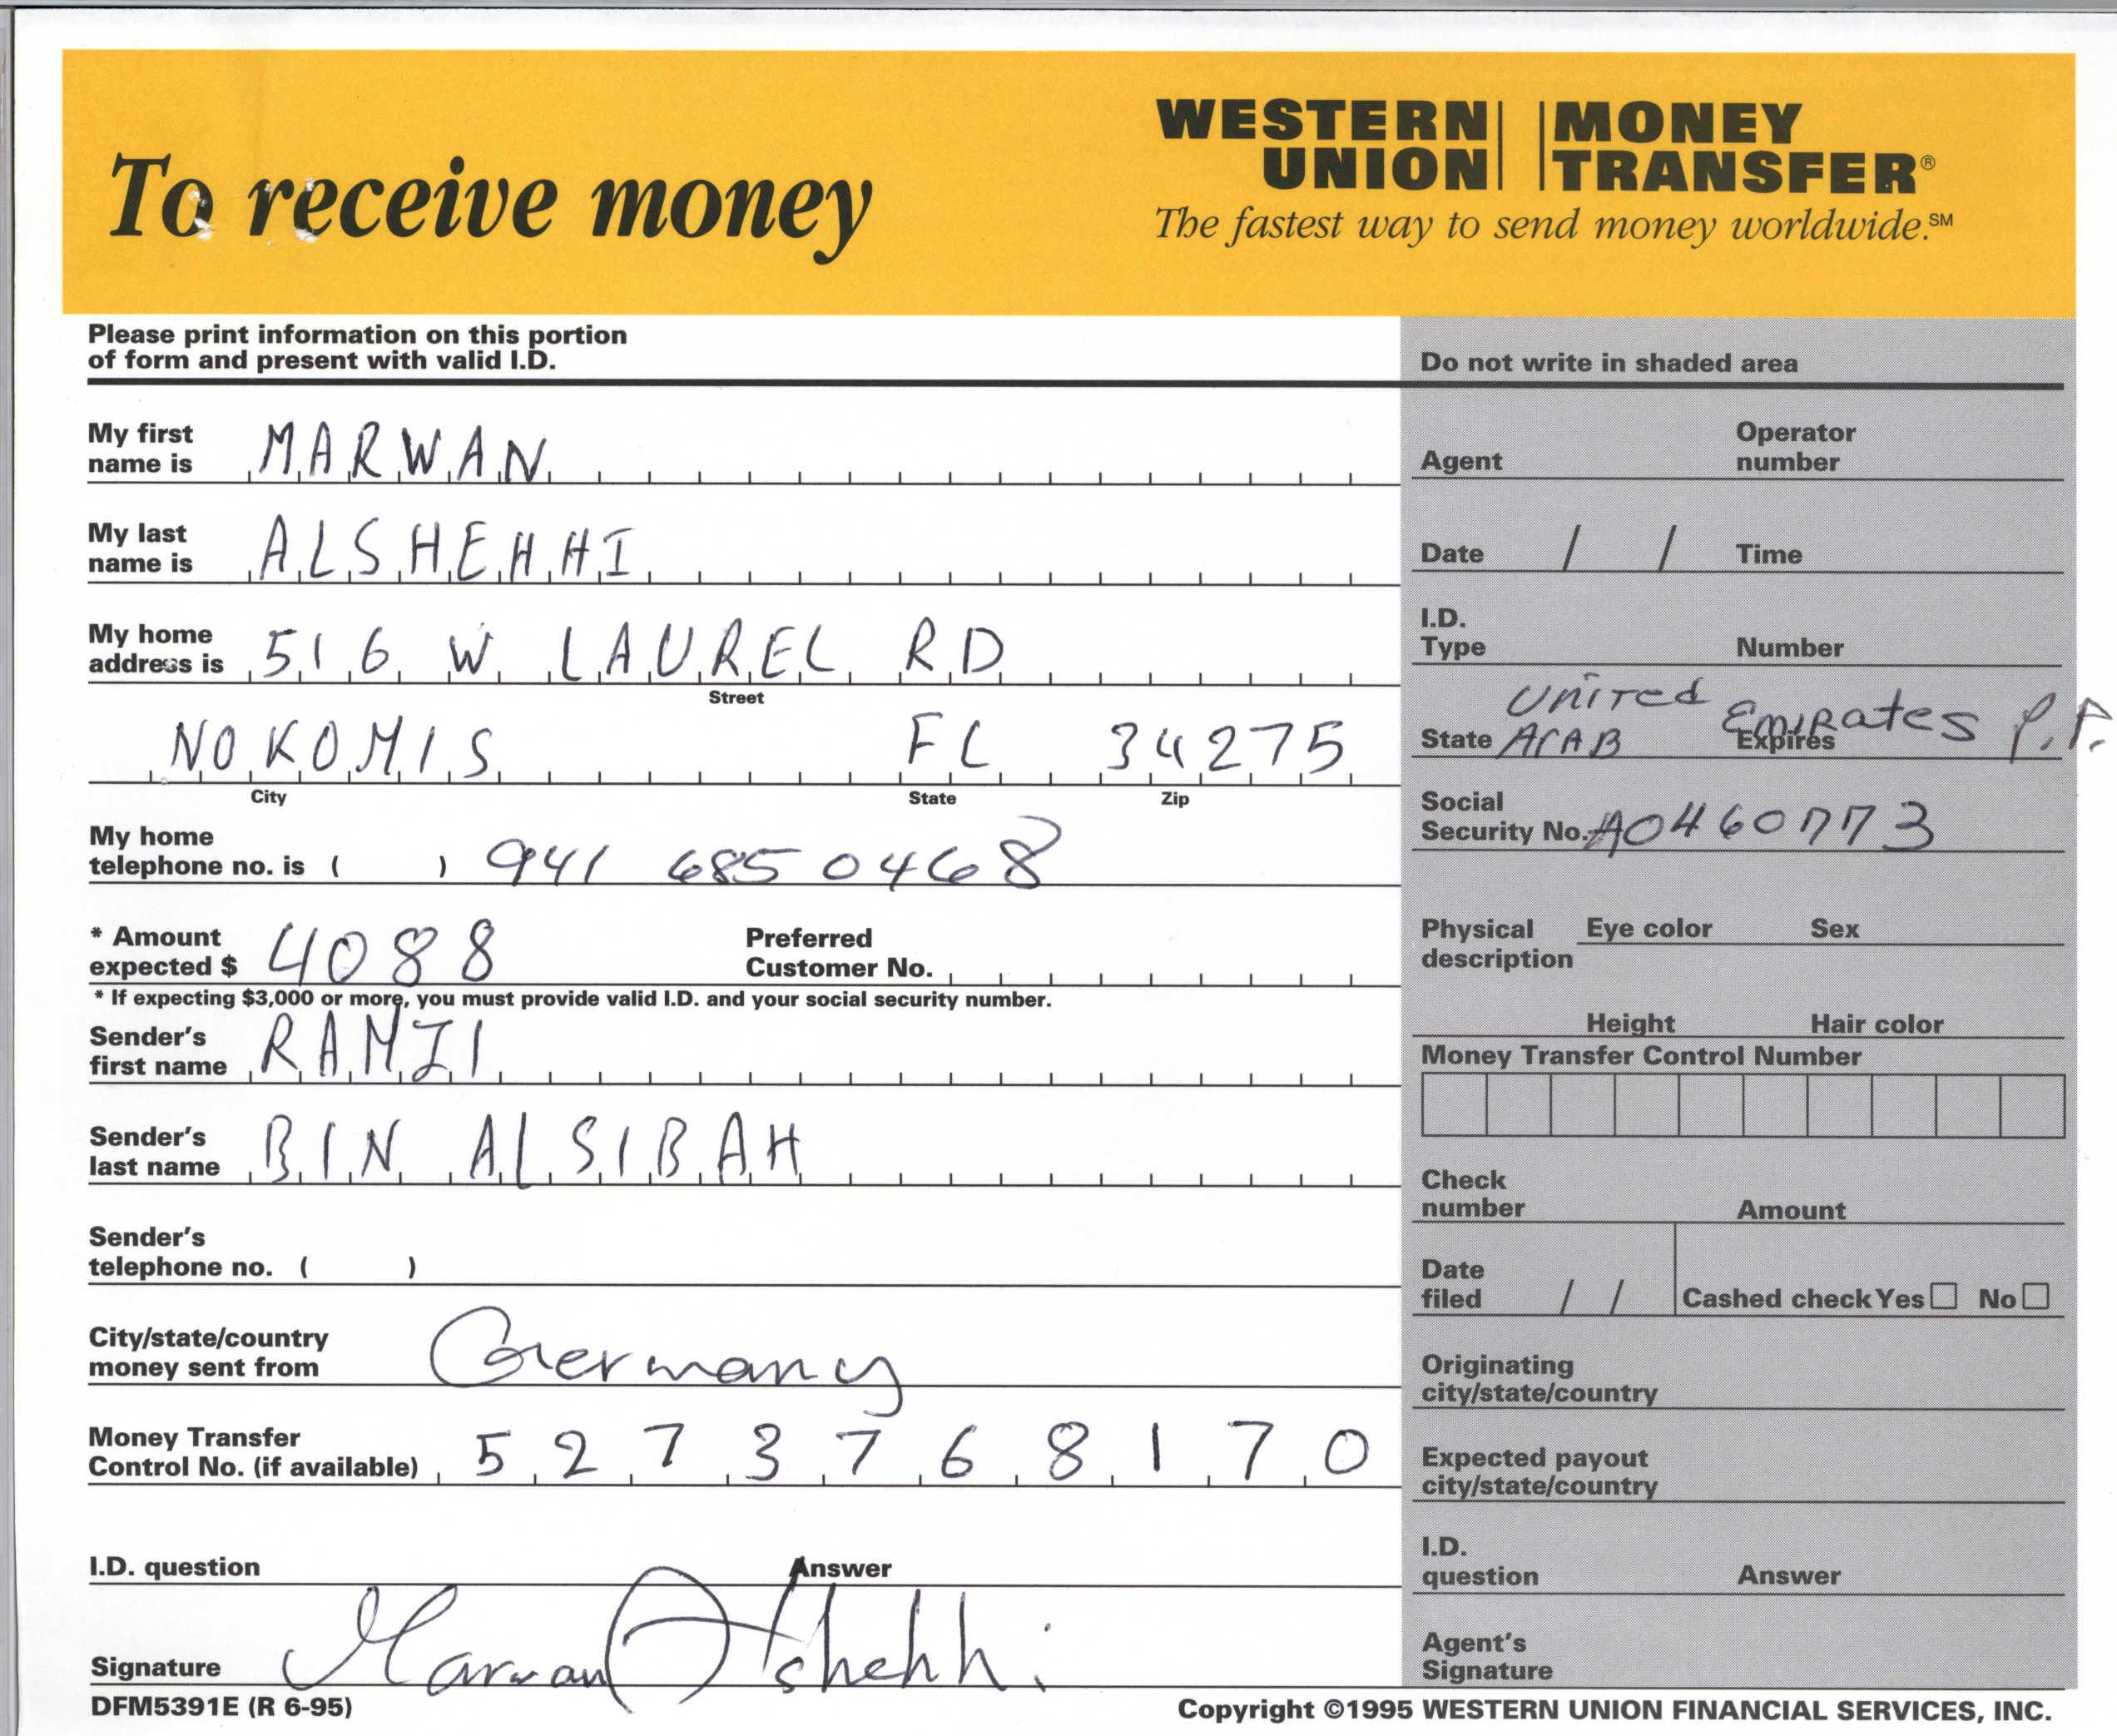 File:Alshehhi Wire Transfer 27 July 2000.jpg - 911myths